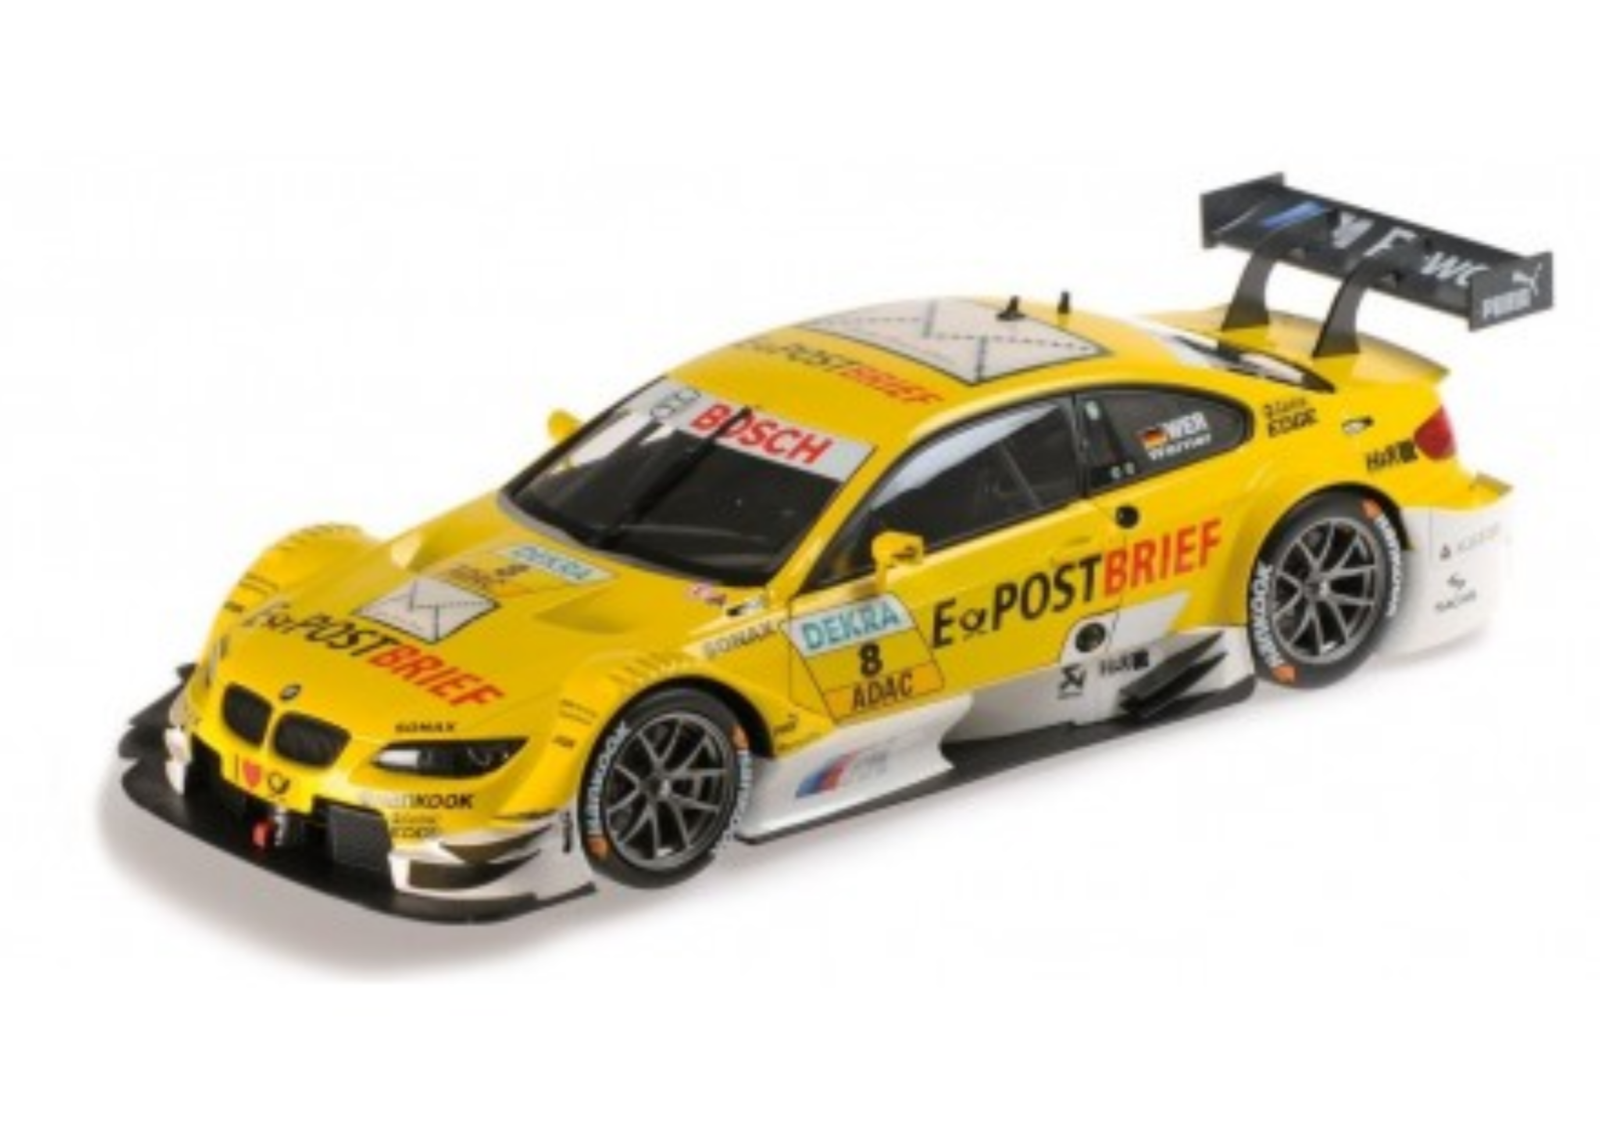 1 18 BMW M3 Werner DTM 2012 1 18 • Minichamps 100122208